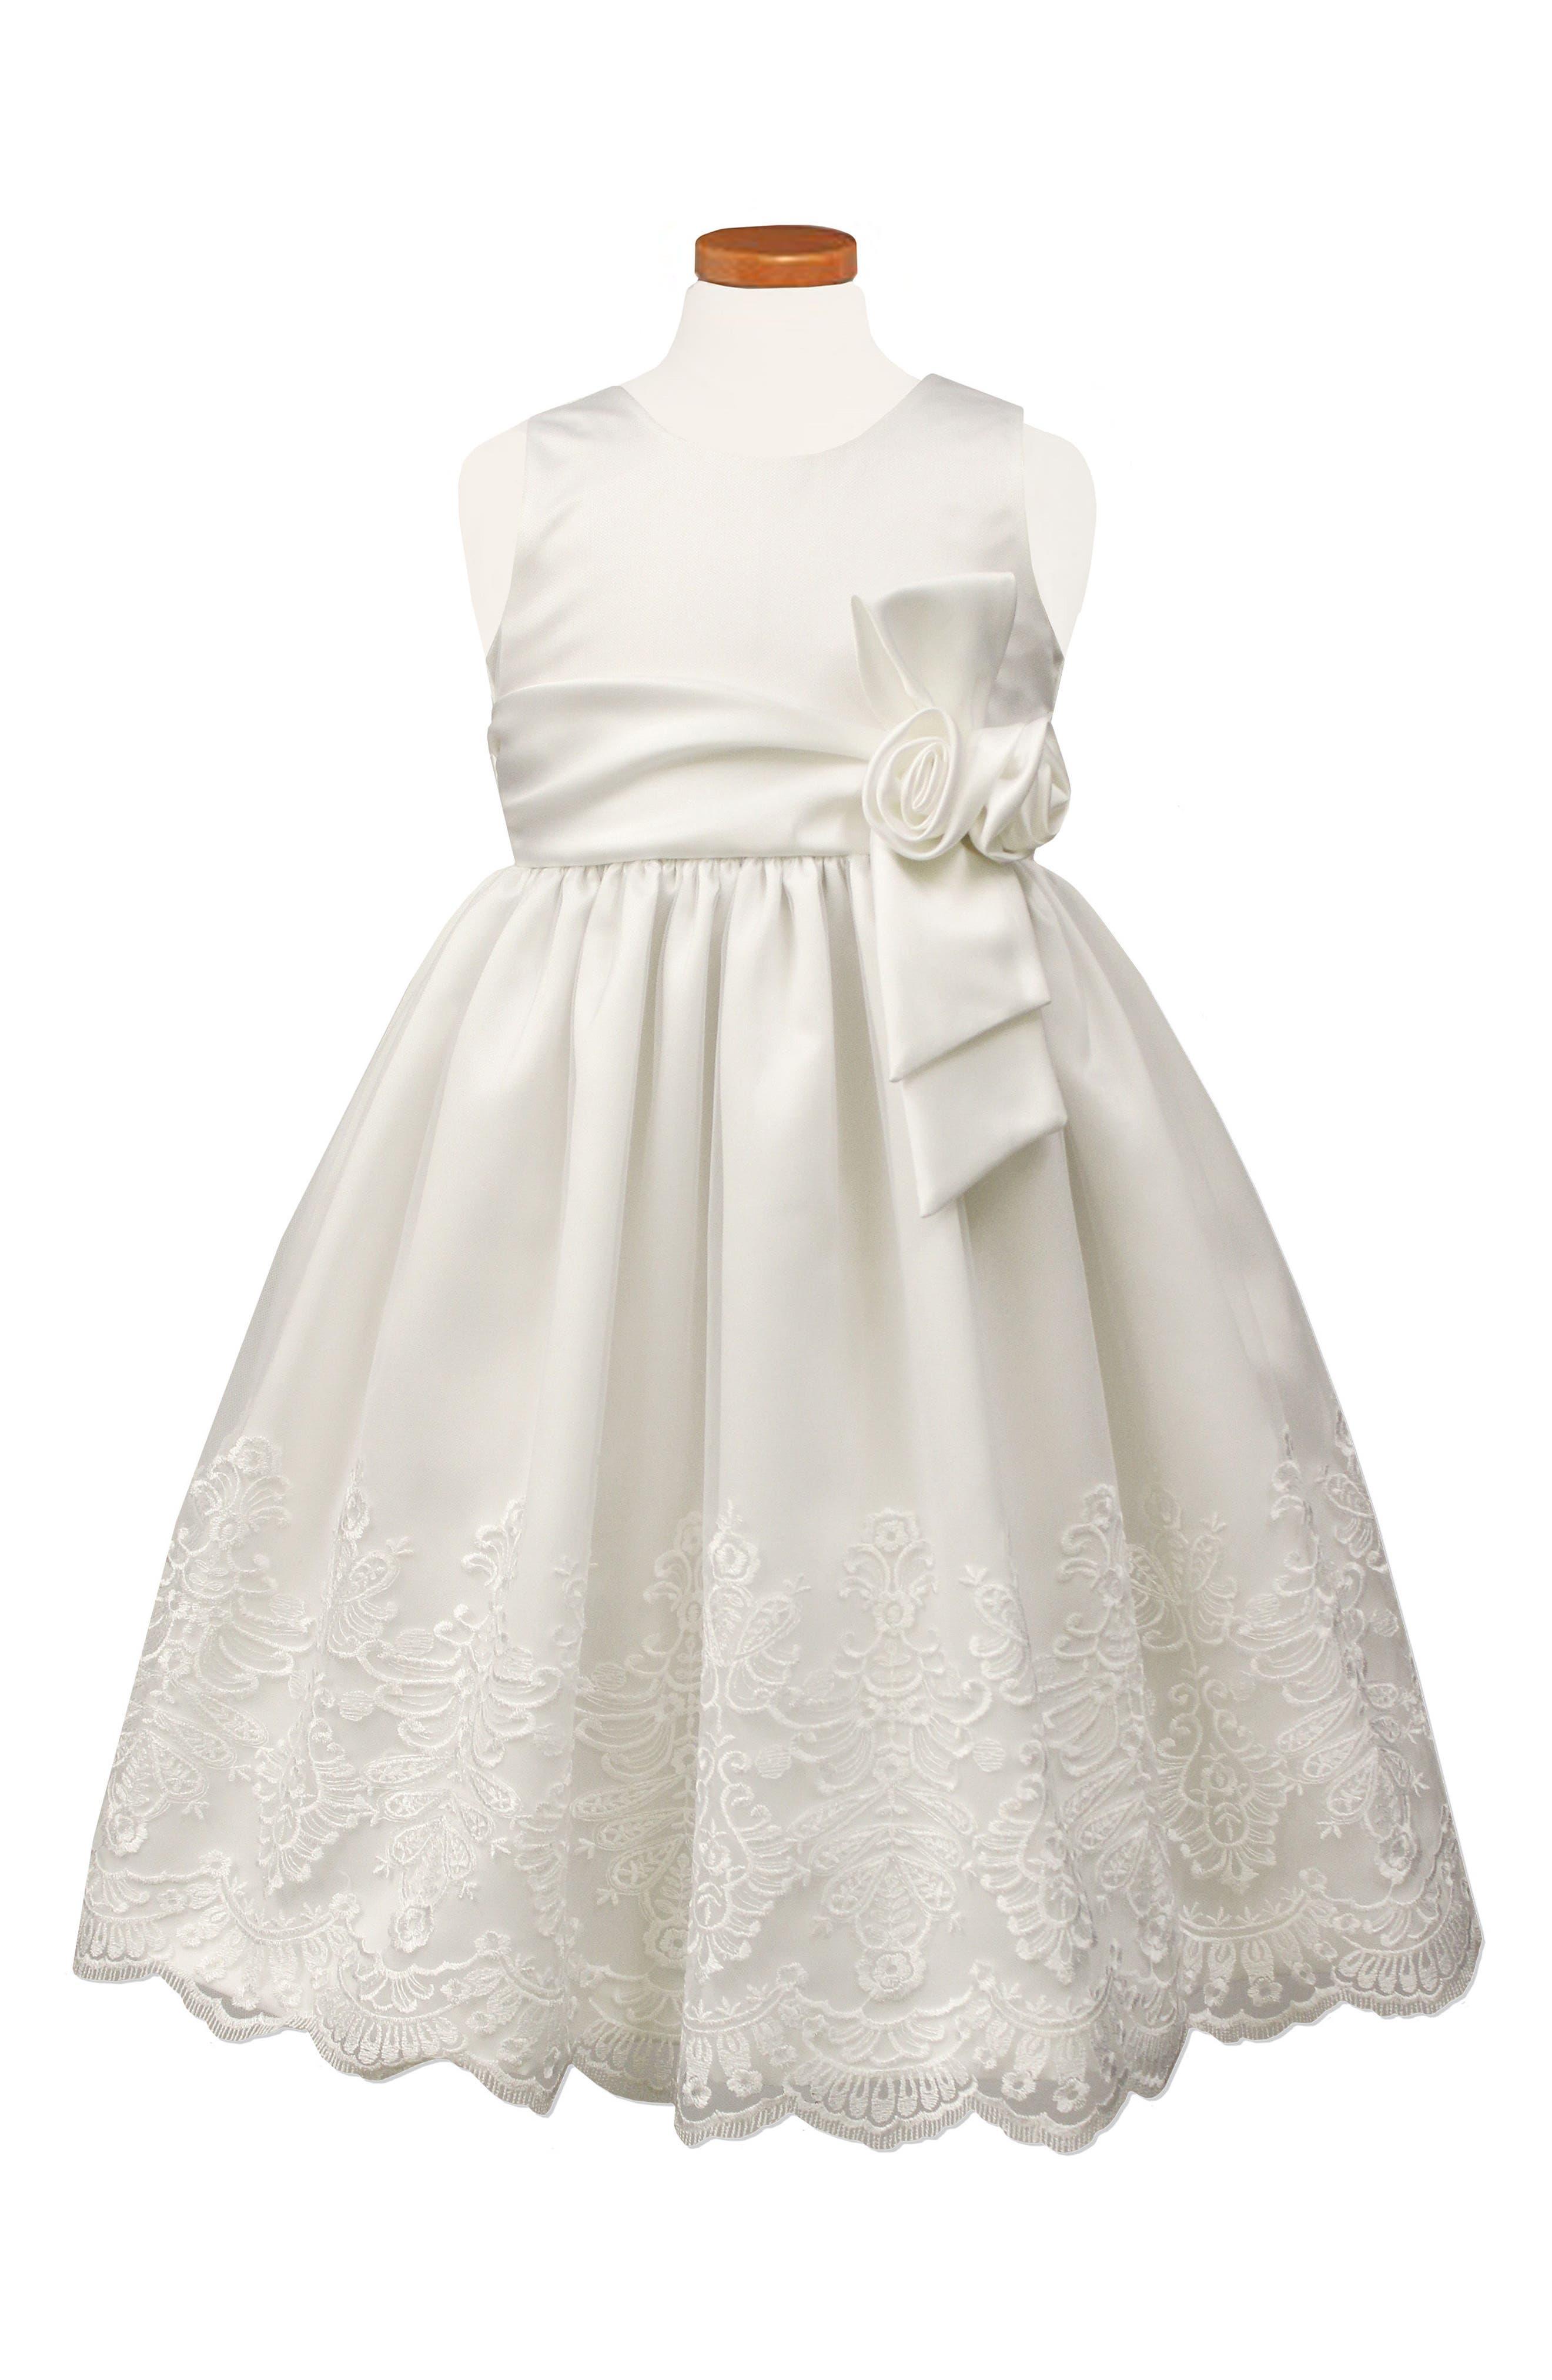 Main Image - Sorbet Embroidered Satin Dress (Toddler Girls, Little Girls & Big Girls)